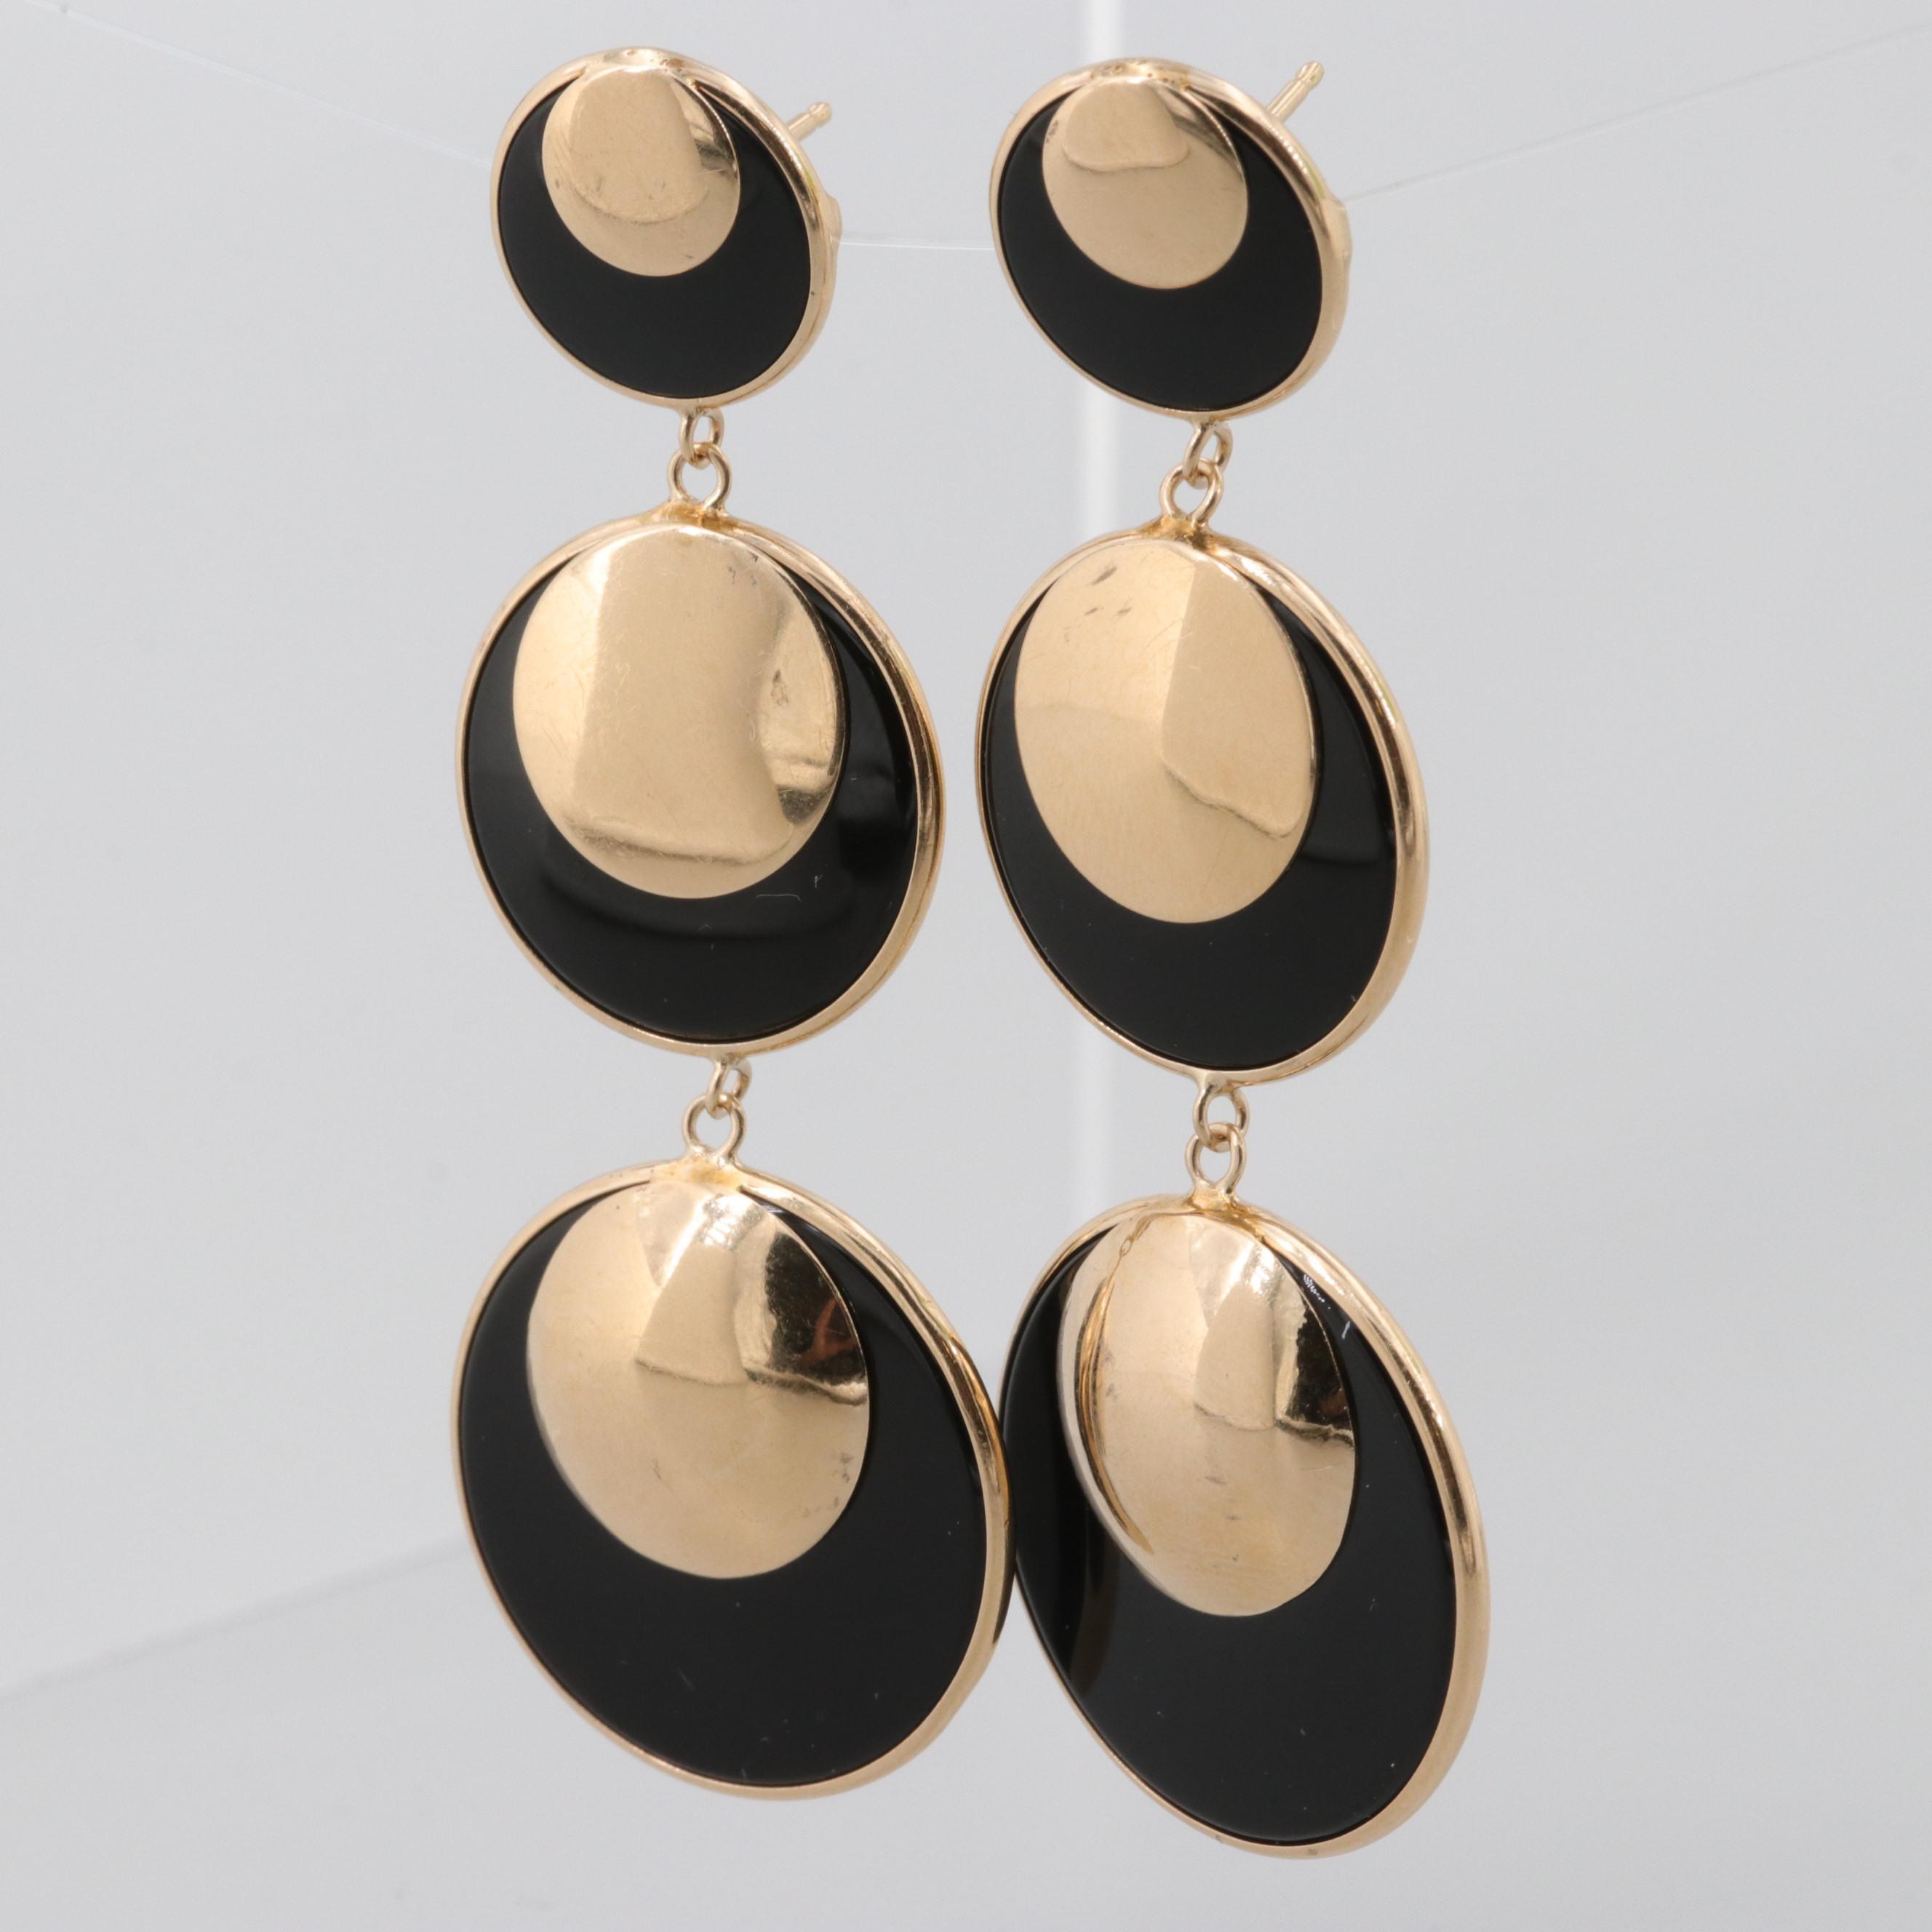 14K Yellow Gold Black Onyx Dangle Earrings